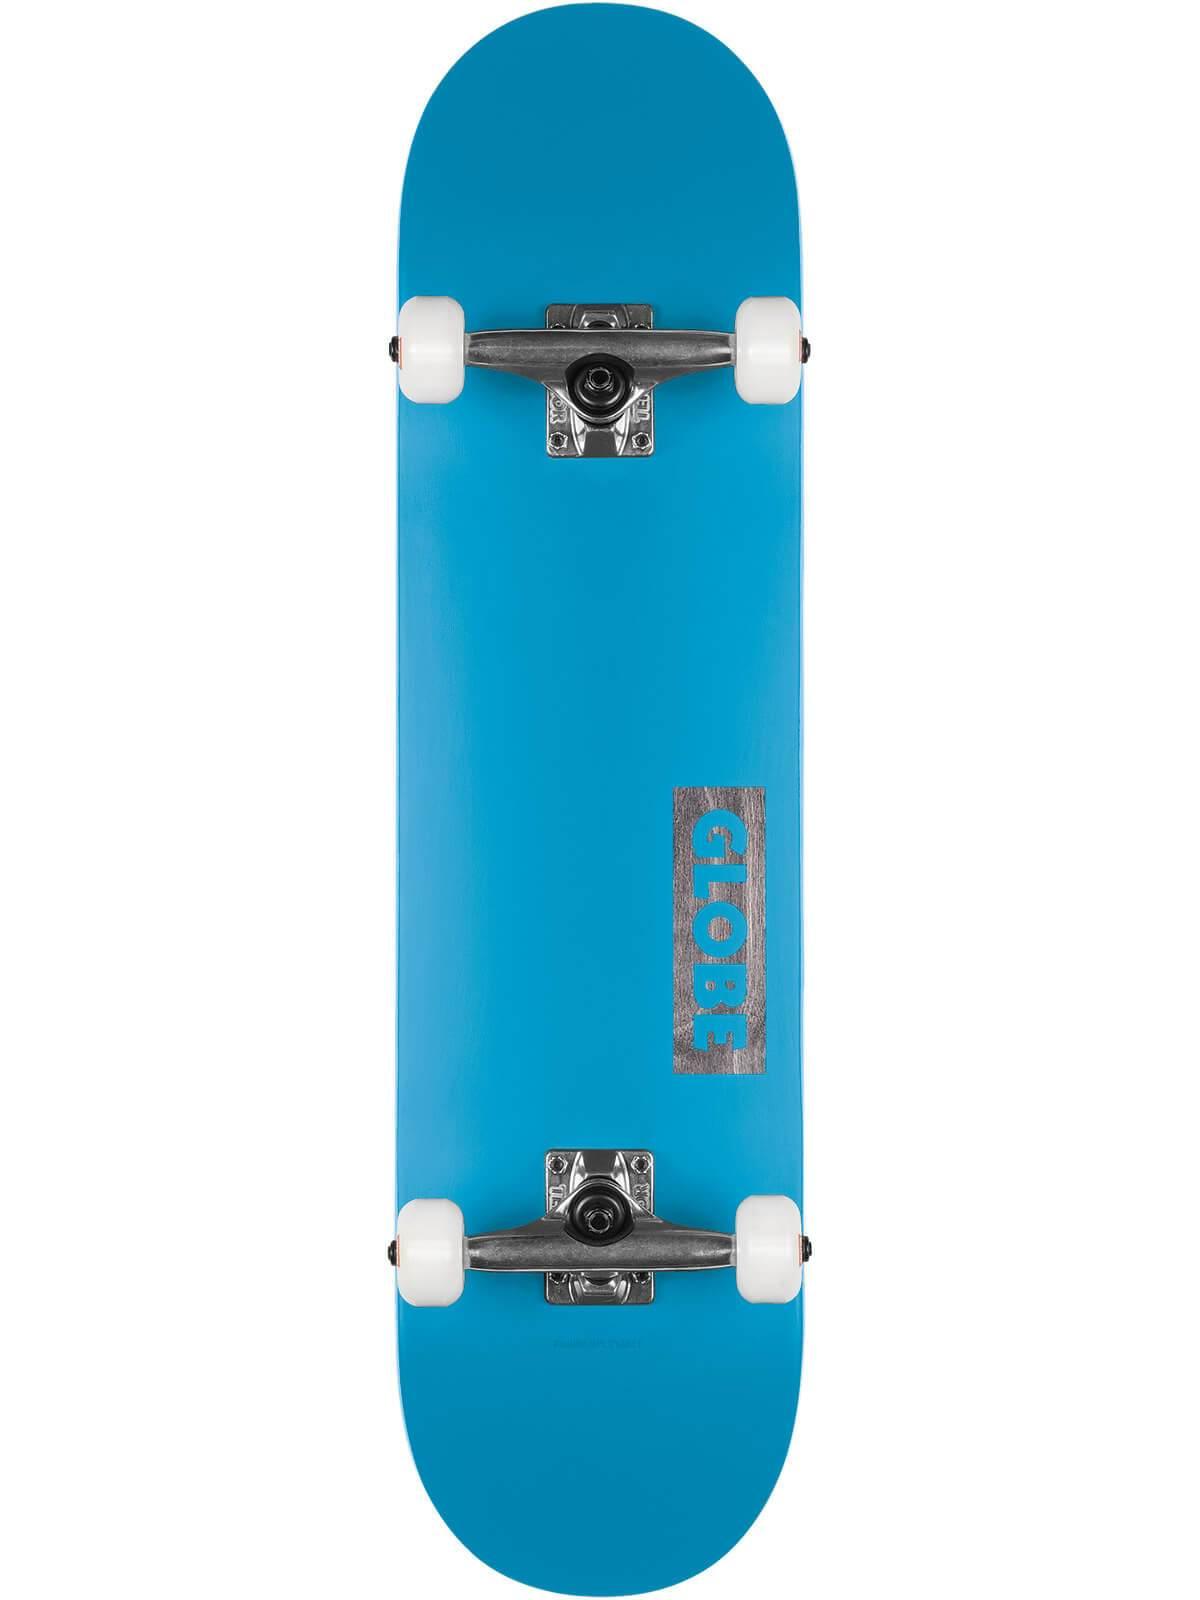 GLOBE GOODSTOCK 8.375 SKATEBOARD COMPLETE - NEON BLUE